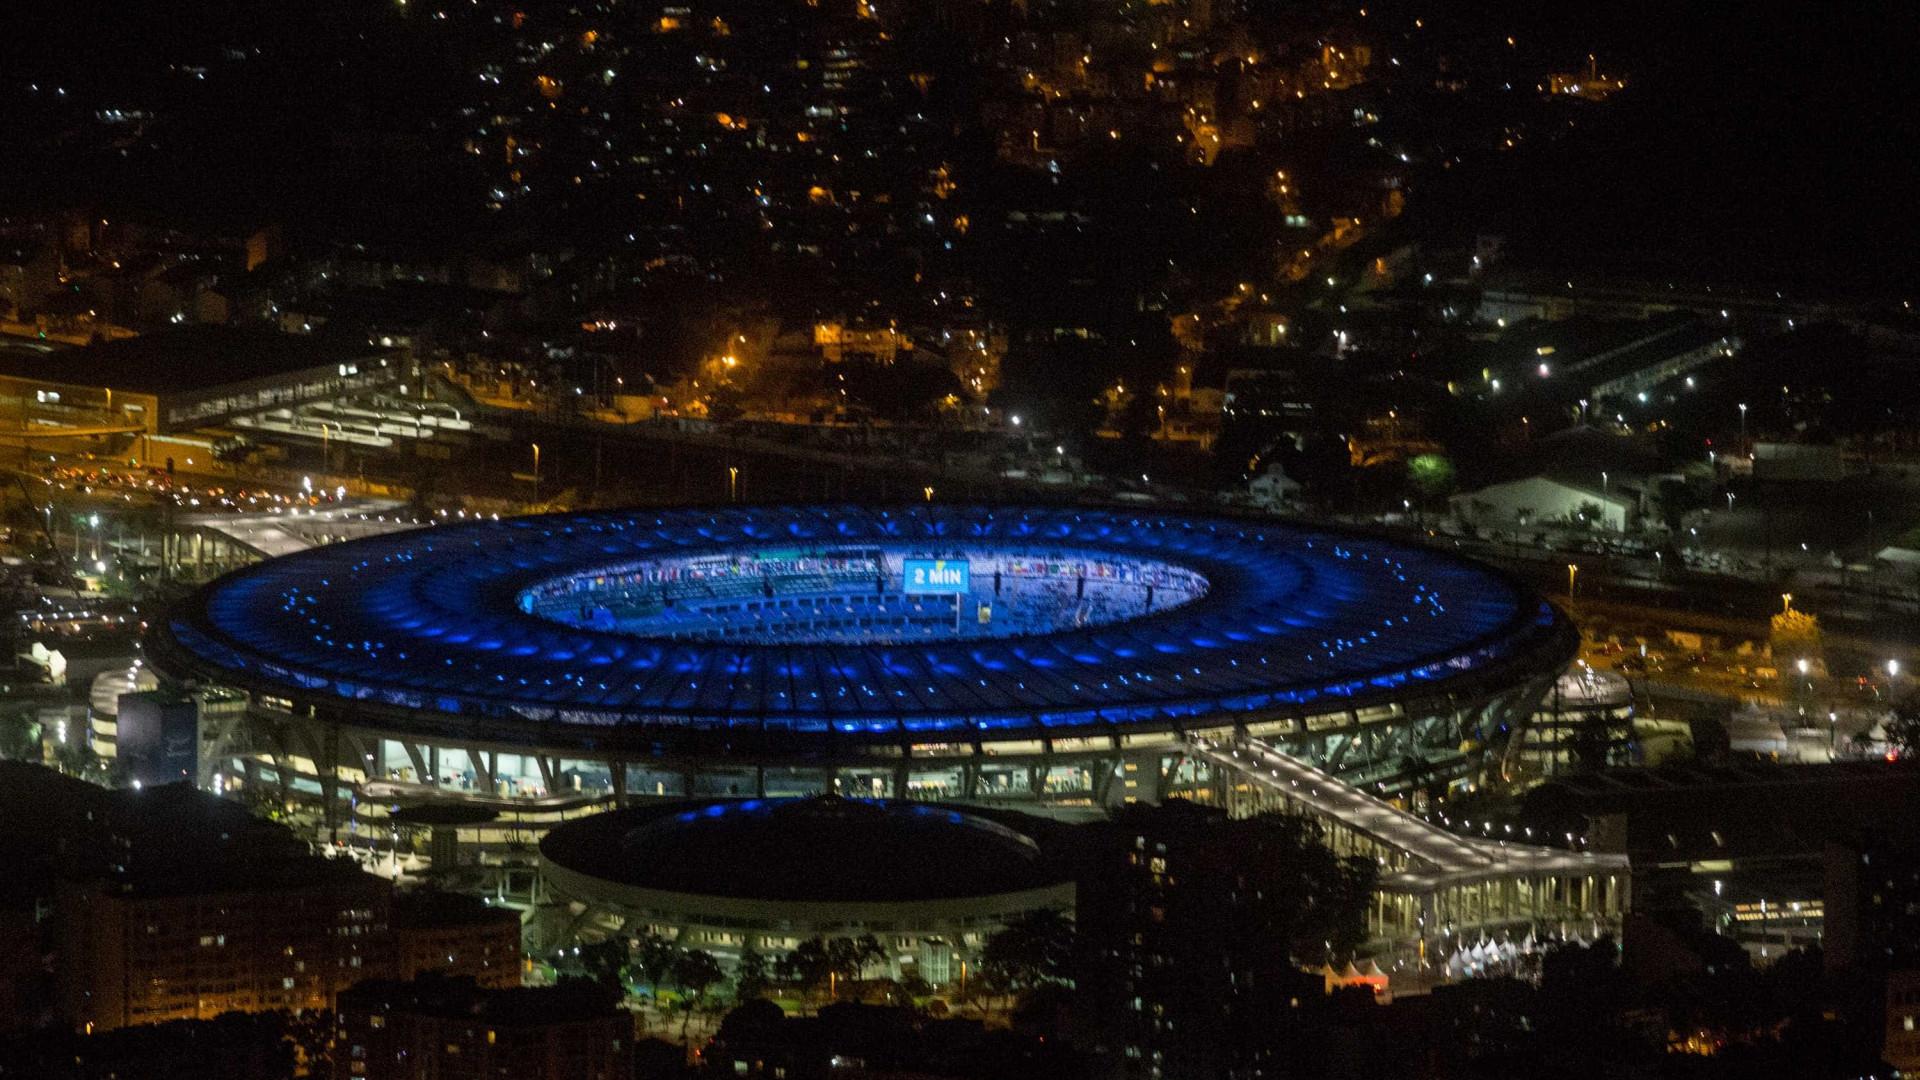 Gisele Bündchen será 'assaltada' na cerimônia de abertura da Rio 2016